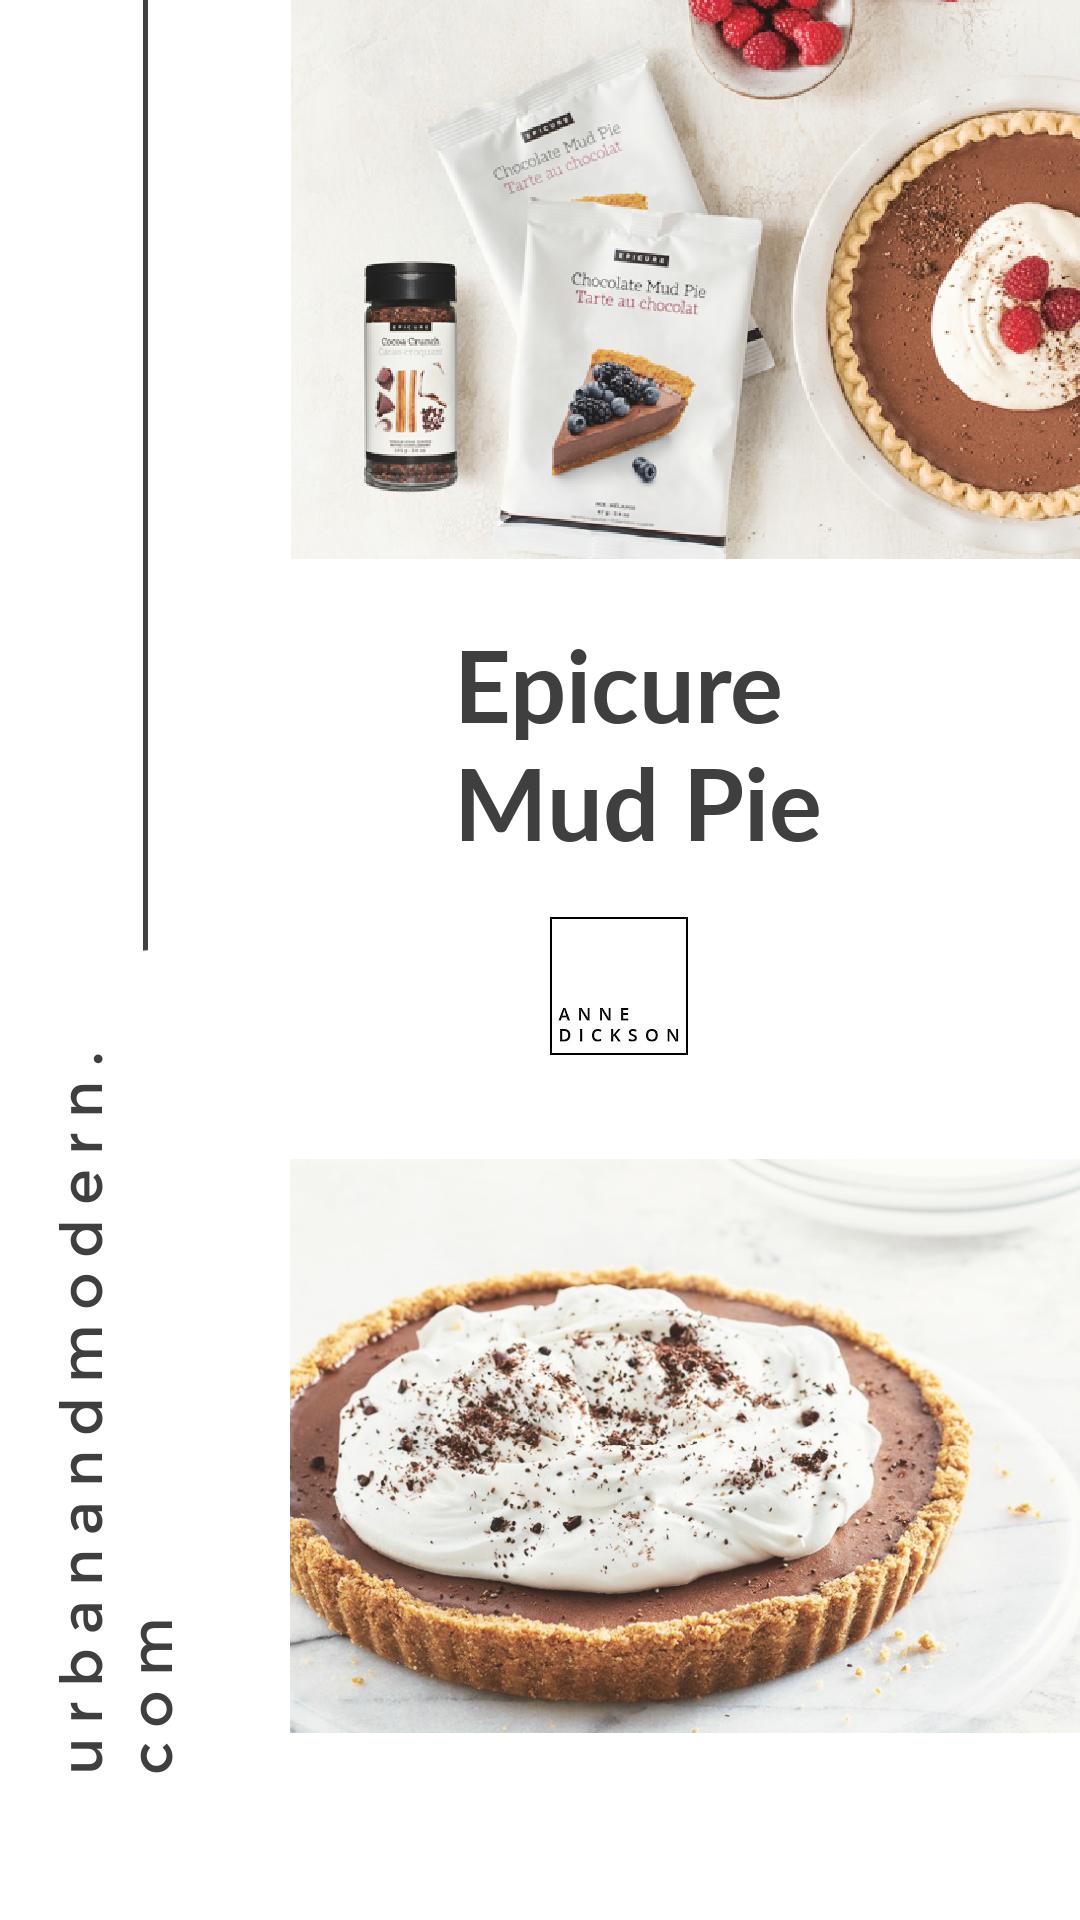 Epicure Mud Pie